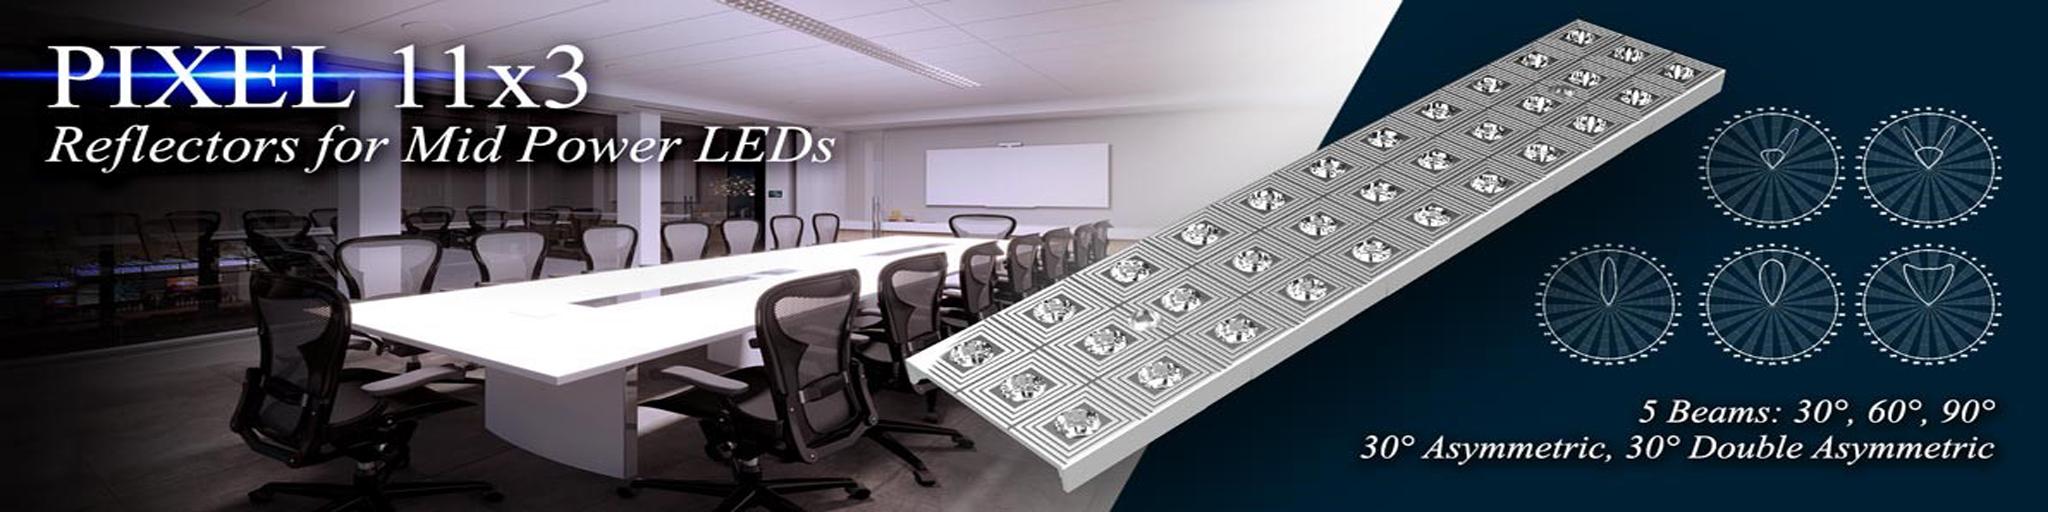 Sistemi Di Illuminazione A Led khatod optical solutions for led lighting and components